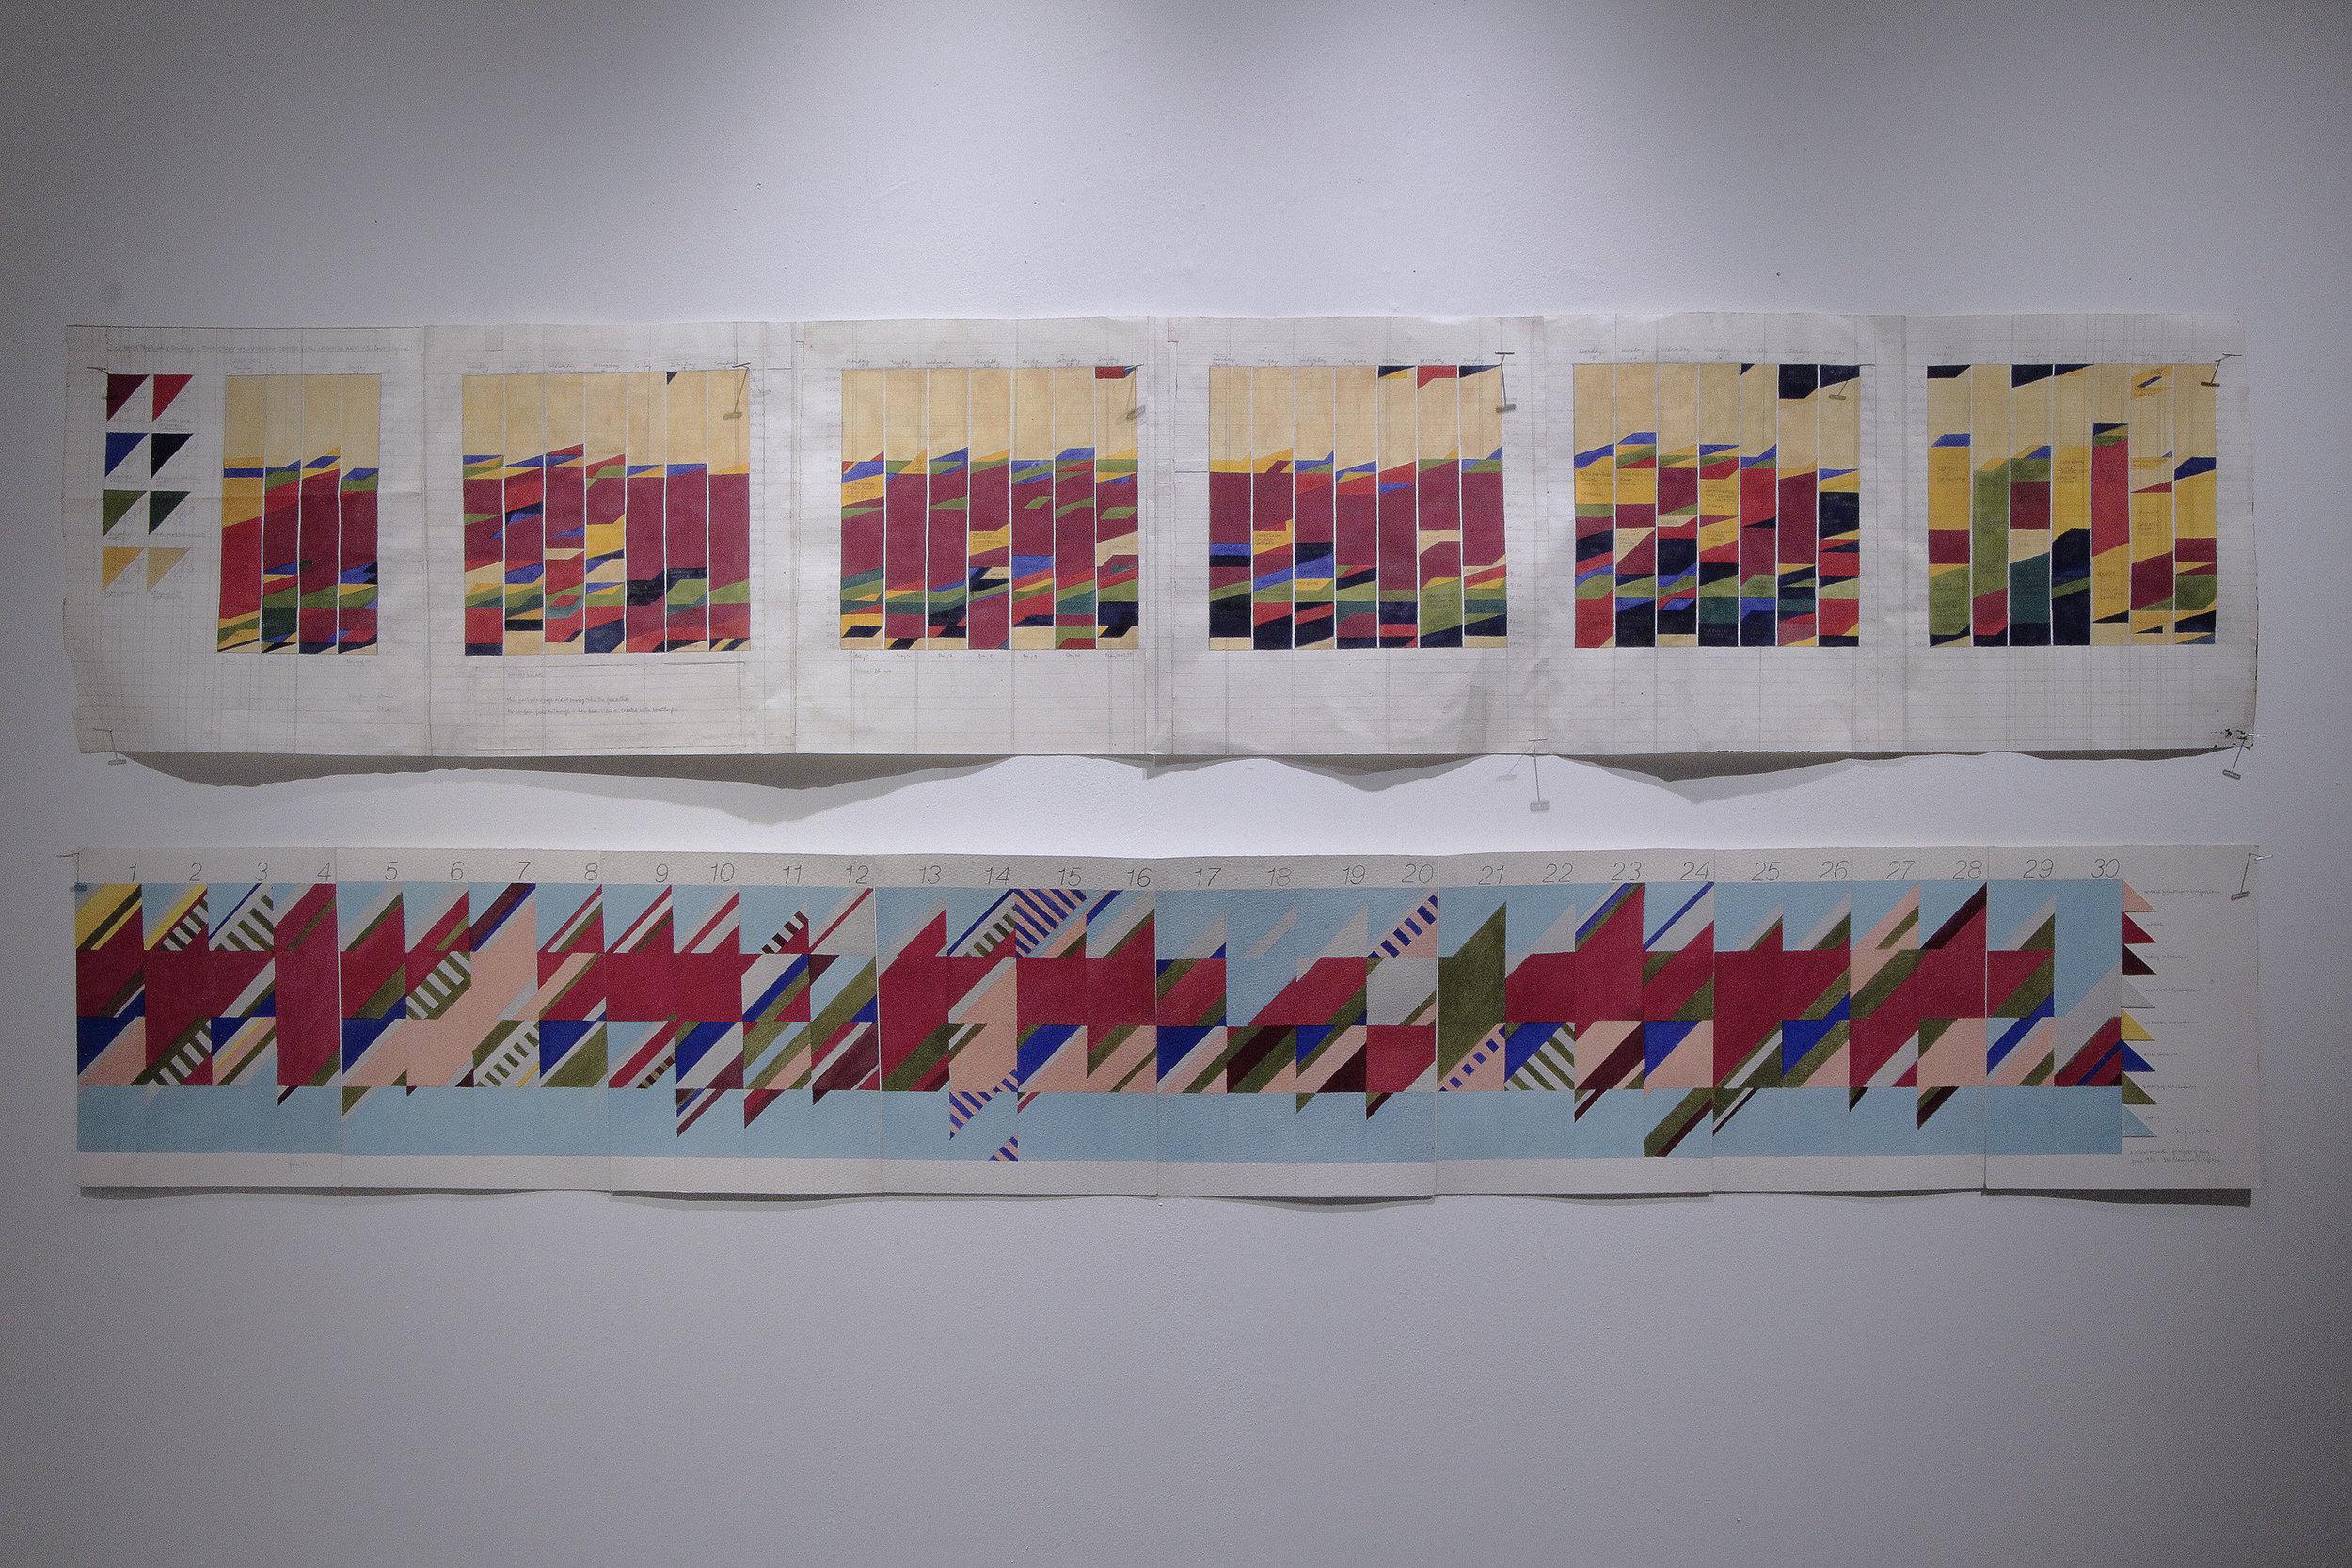 | 上 Top |  時間研究:二零一二年七月到八月  Time Study: July to August, 2012  32 x 161.5cm / 12.6 x 63.6inches  水粉、鉛筆與紙張/Gouache and graphite on paper    | 下Bottom |  時間研究:一九九二年六月,舊金山  Time Study:June, 1992, San Francisco  25.5 x 159cm / 10 x 62.6inches  水粉、鉛筆與紙張/Gouacheand graphite on paper